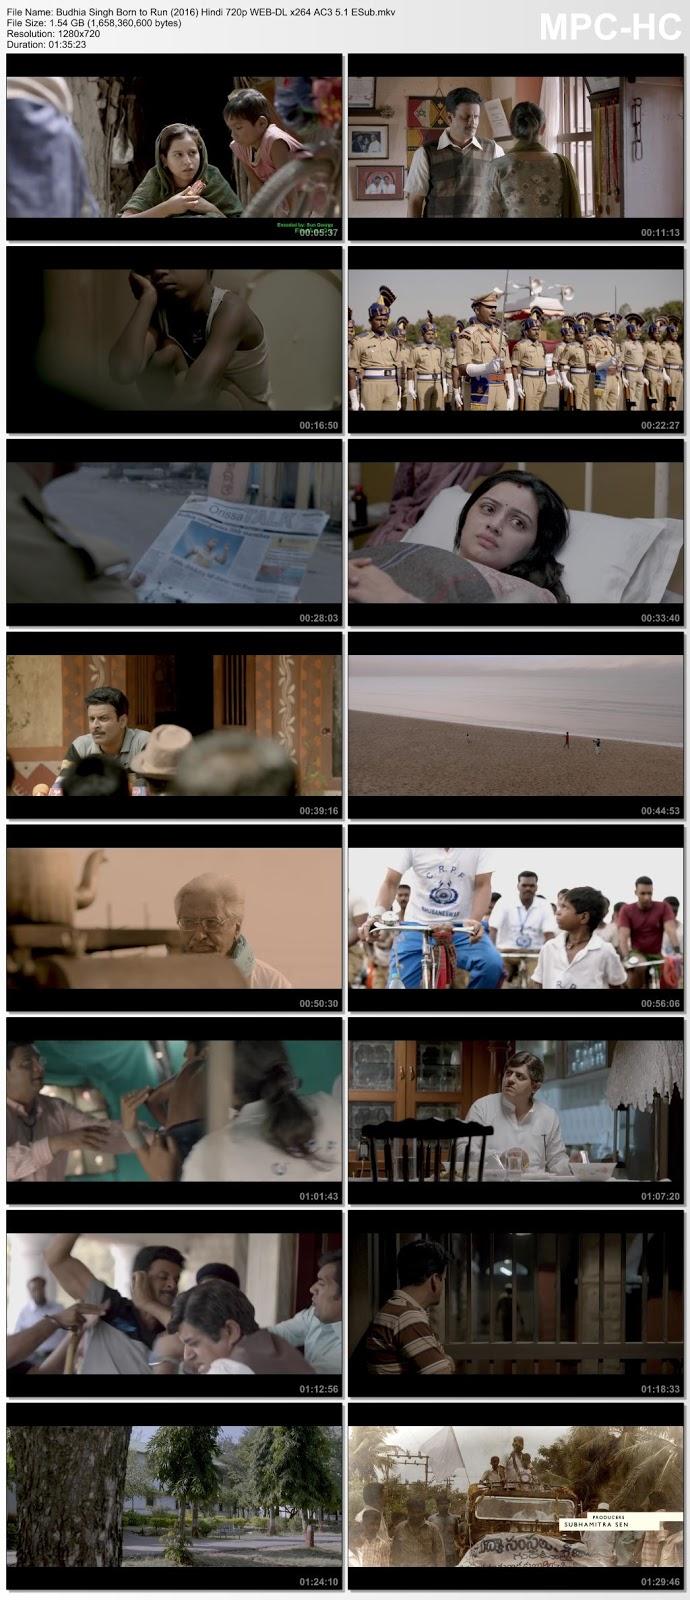 Budhia Singh Born to Run (2016) Hindi 720p WEB-DL x264 AC3 5.1 ESub 1.5GB Desirehub